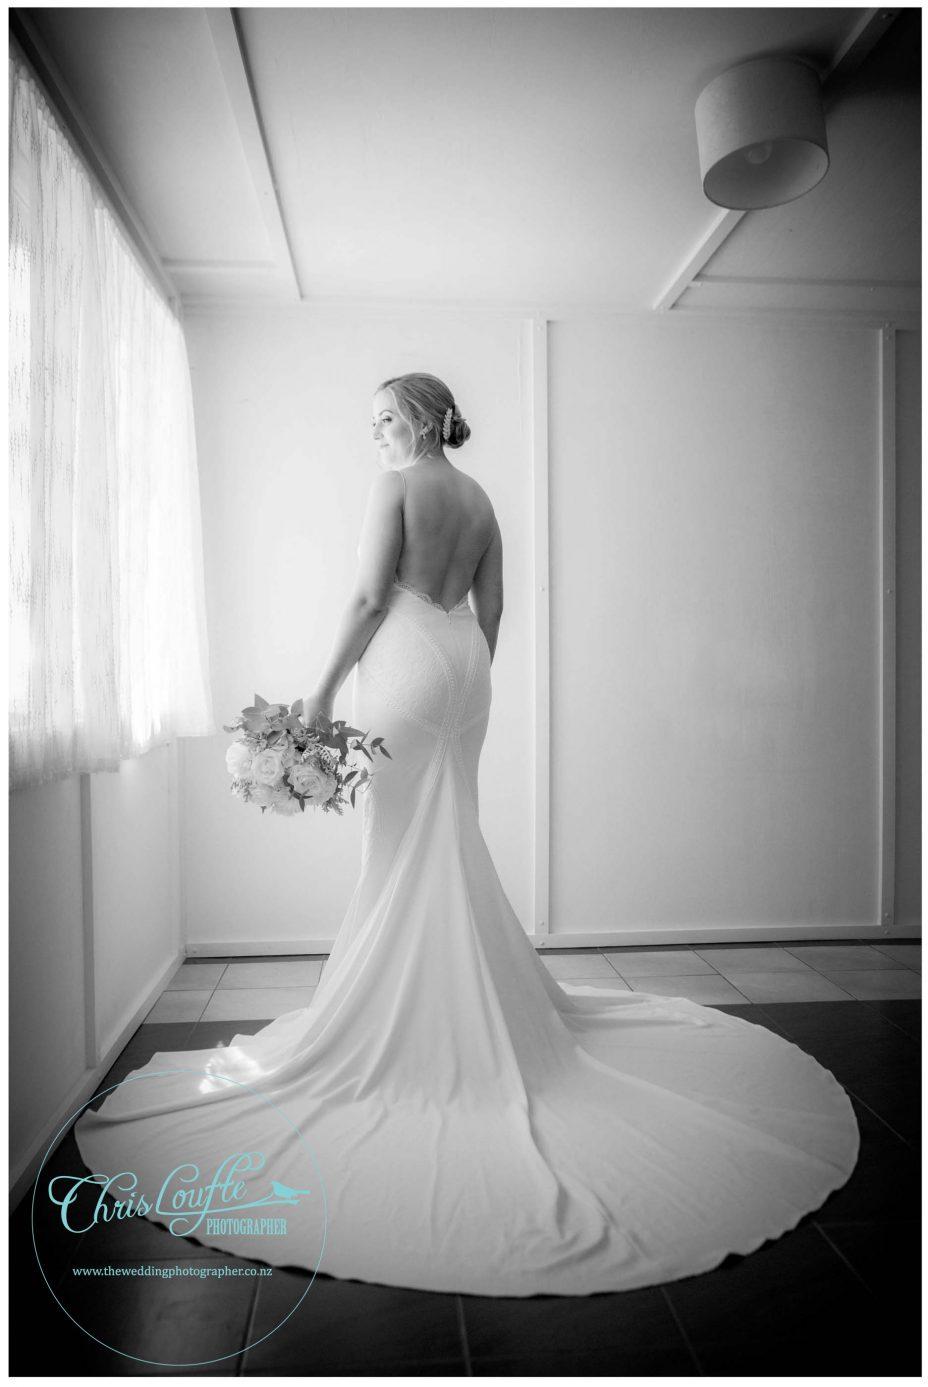 Bride in ivory backless wedding dress, wedding bouquet flowers, black and white photo, natural window light, Kumeu wedding